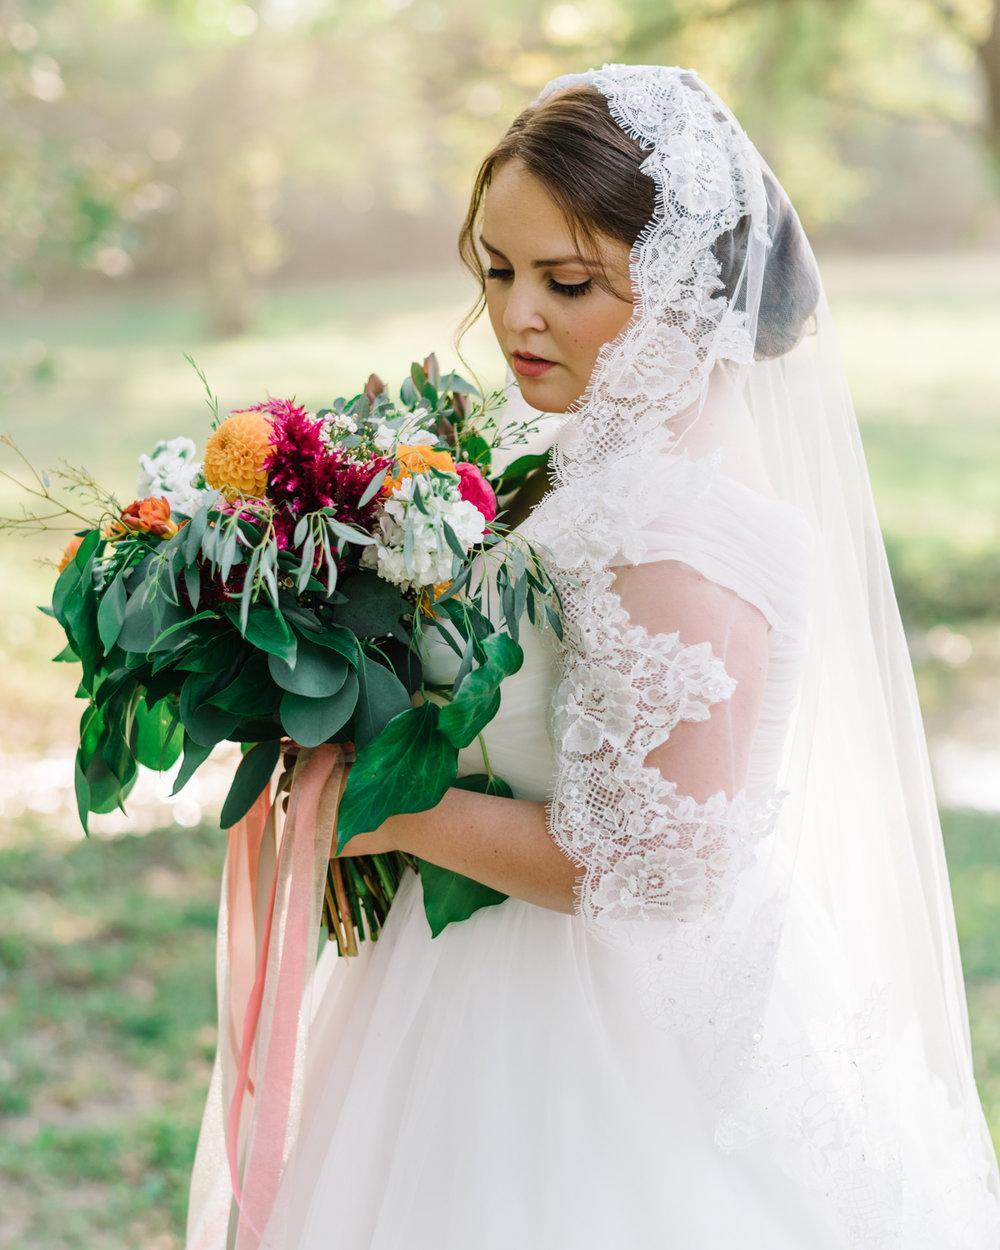 Wichita, Kansas Outdoor Wedding-Neal Dieker-Pinecrest Country Place-Wichita, Kansas Wedding Photographer-189.jpg